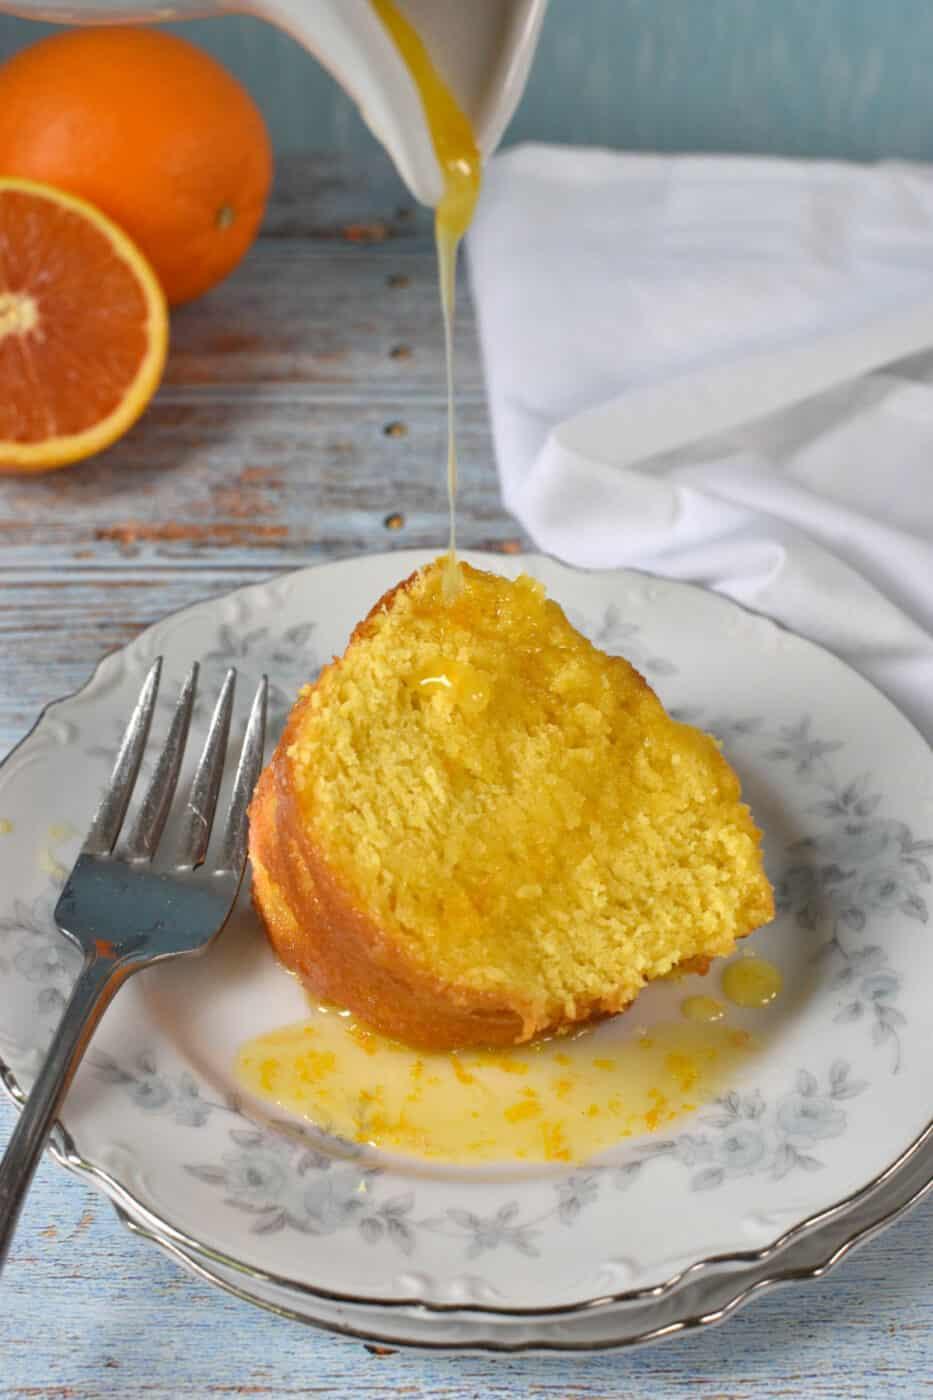 Drizzling orange glaze on a slice of orange cake